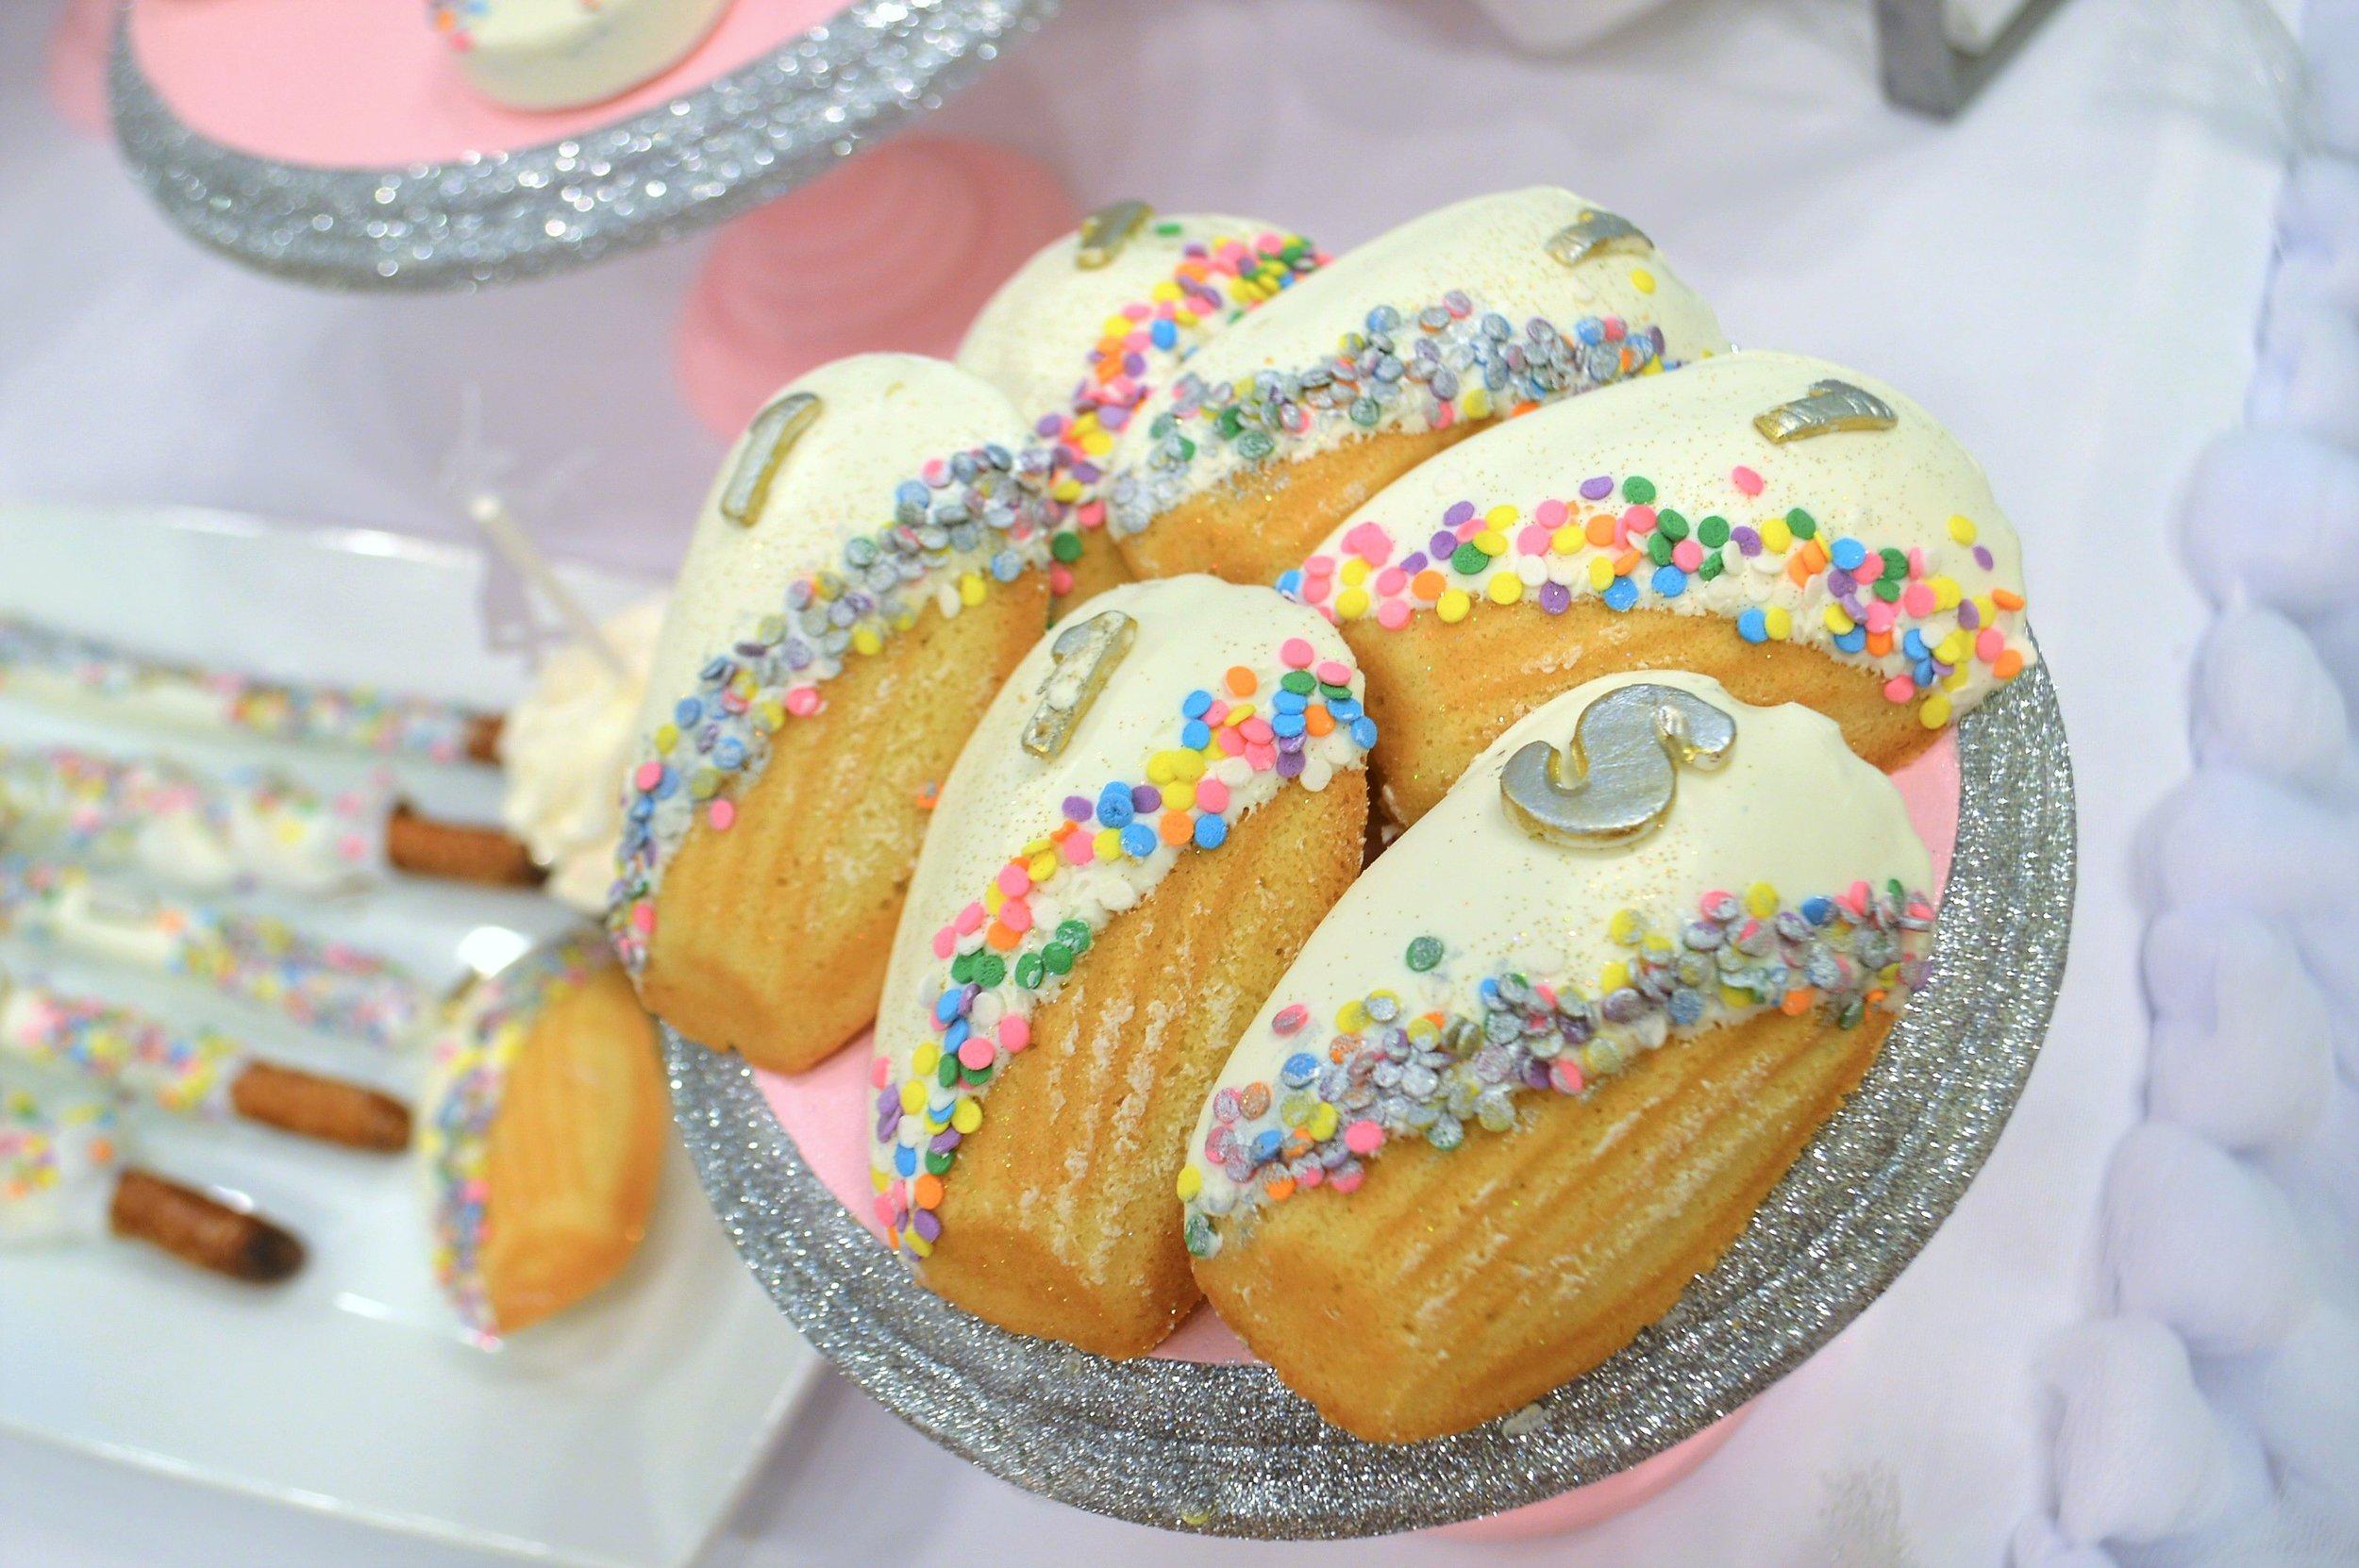 unicorn birthday-unicorn desserts-unicorn first birthday party-unicorn dessert ideas-unicorn birthday party-www.SugarPartiesLA.com.jpg